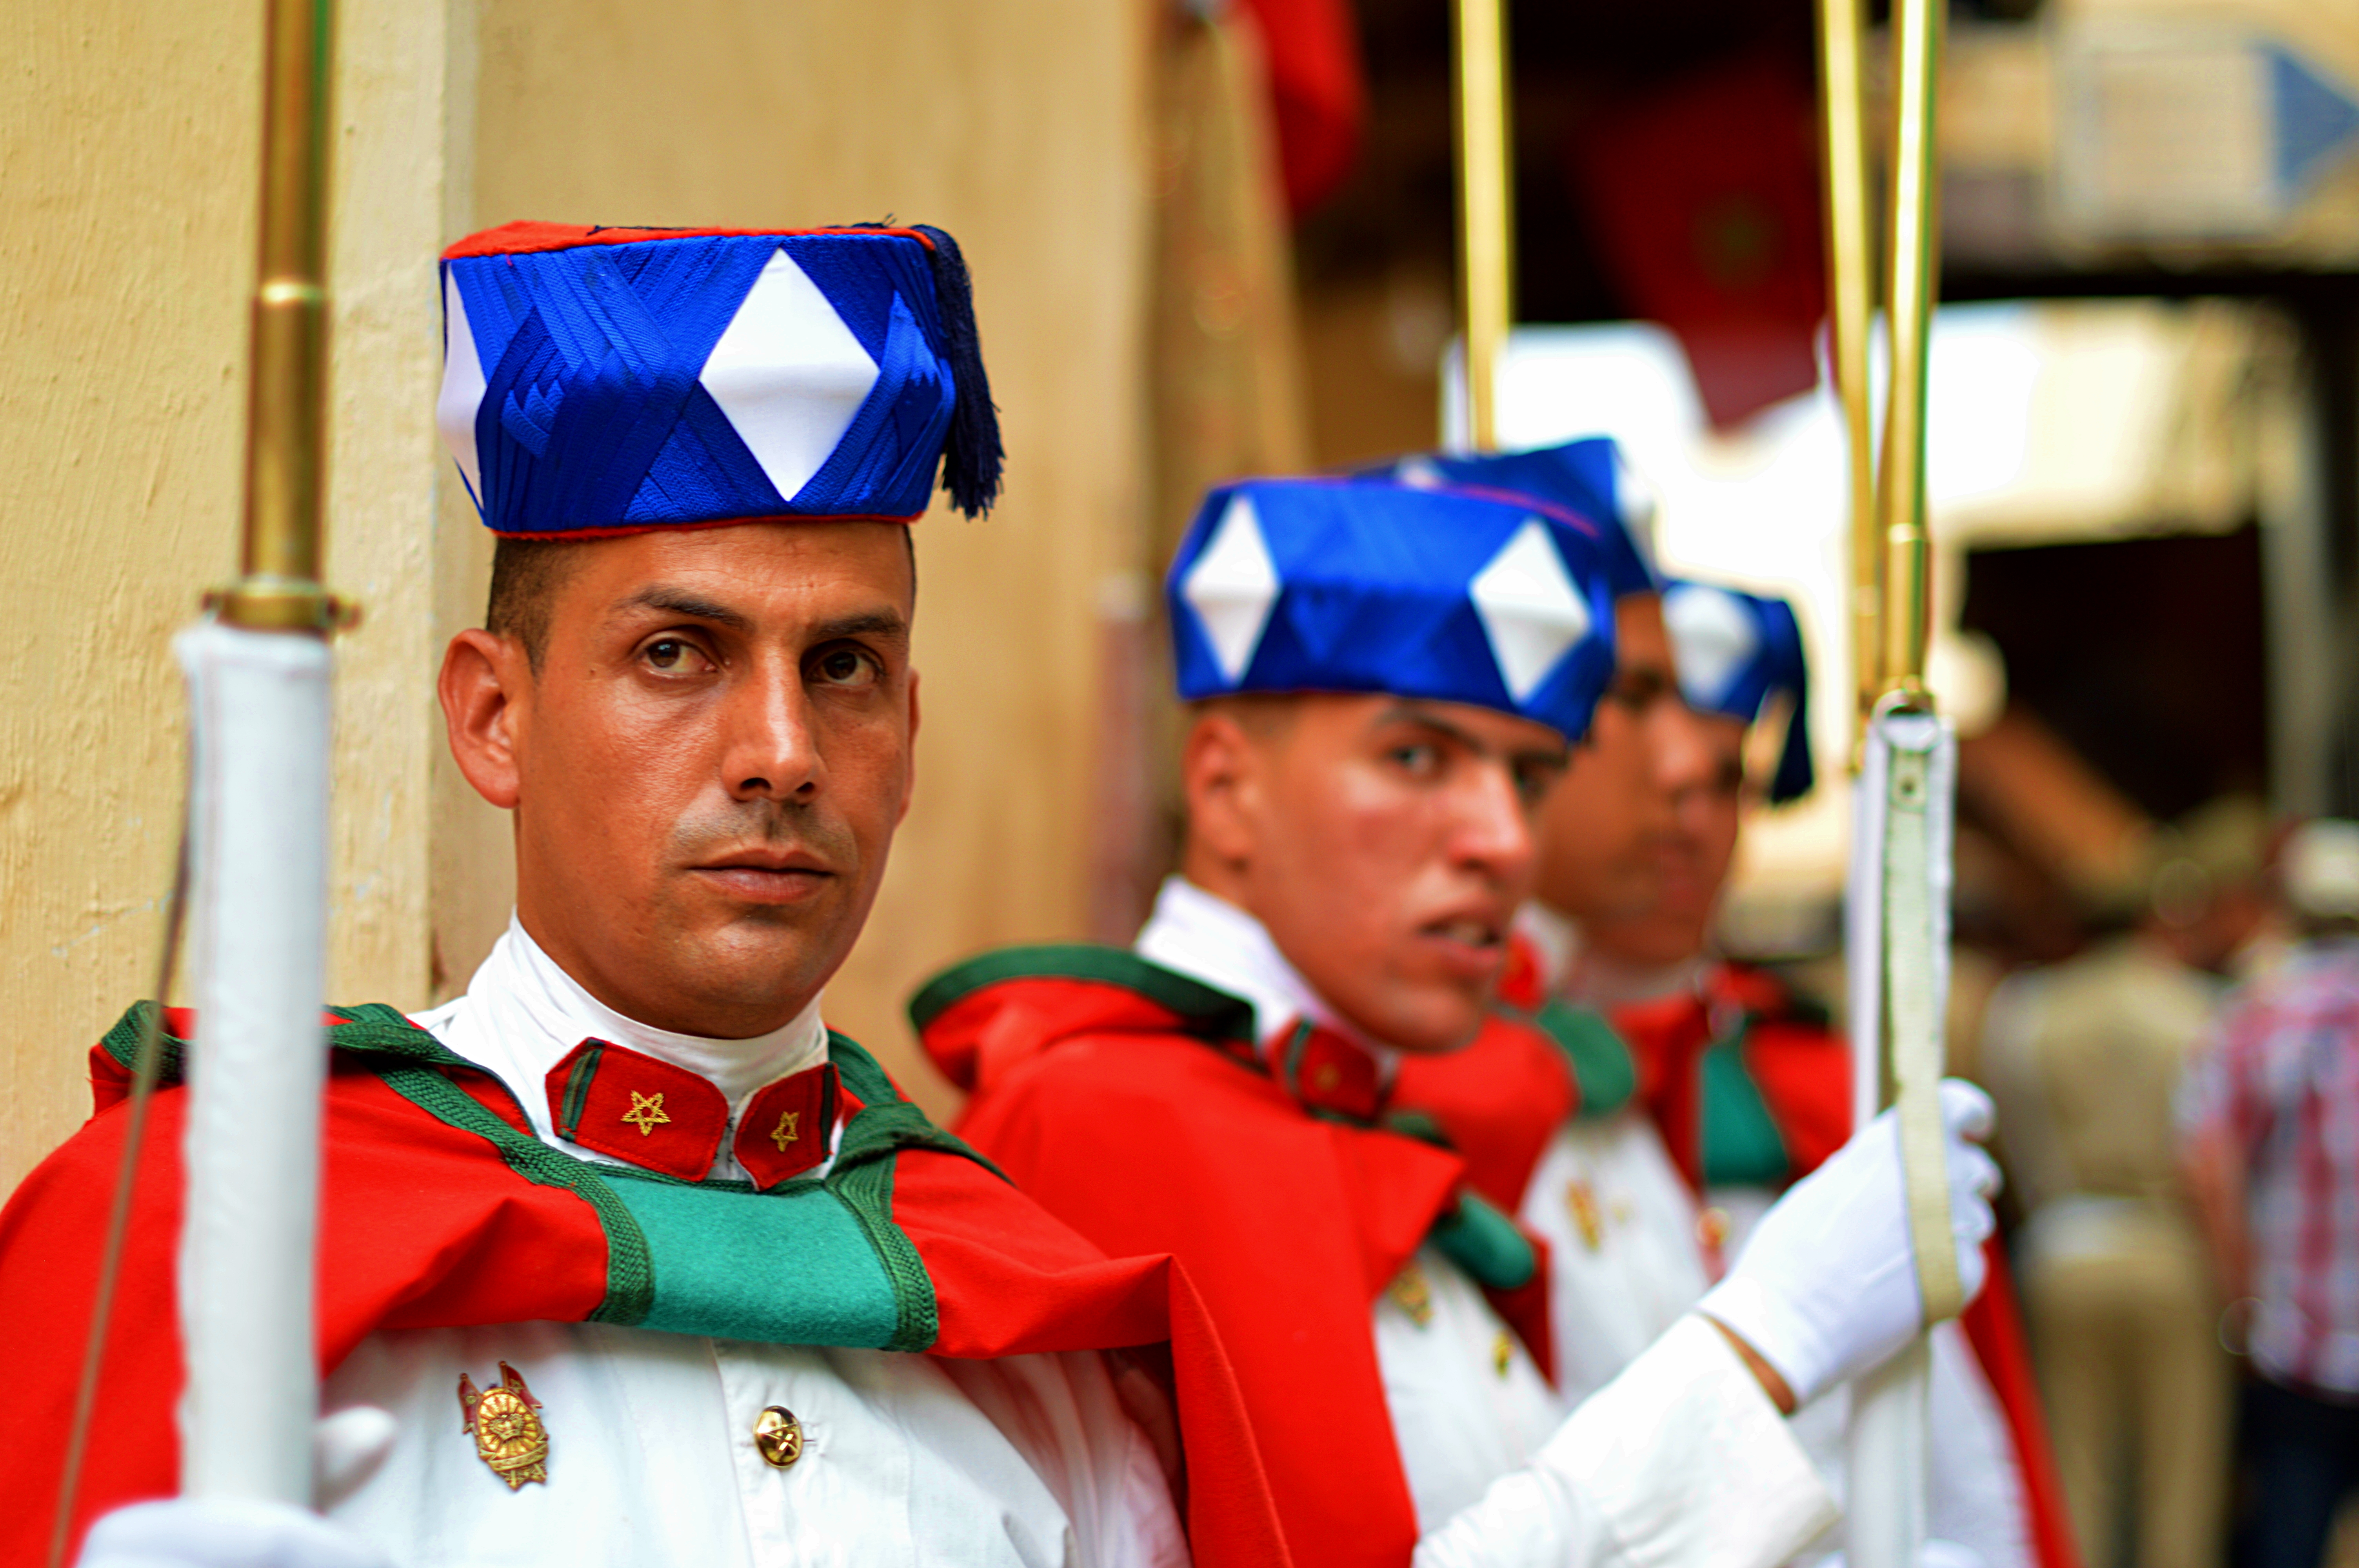 La Garde Royale Marocaine / Moroccan Royal Guard - Page 13 34071625513_81a7fdc53f_o_d